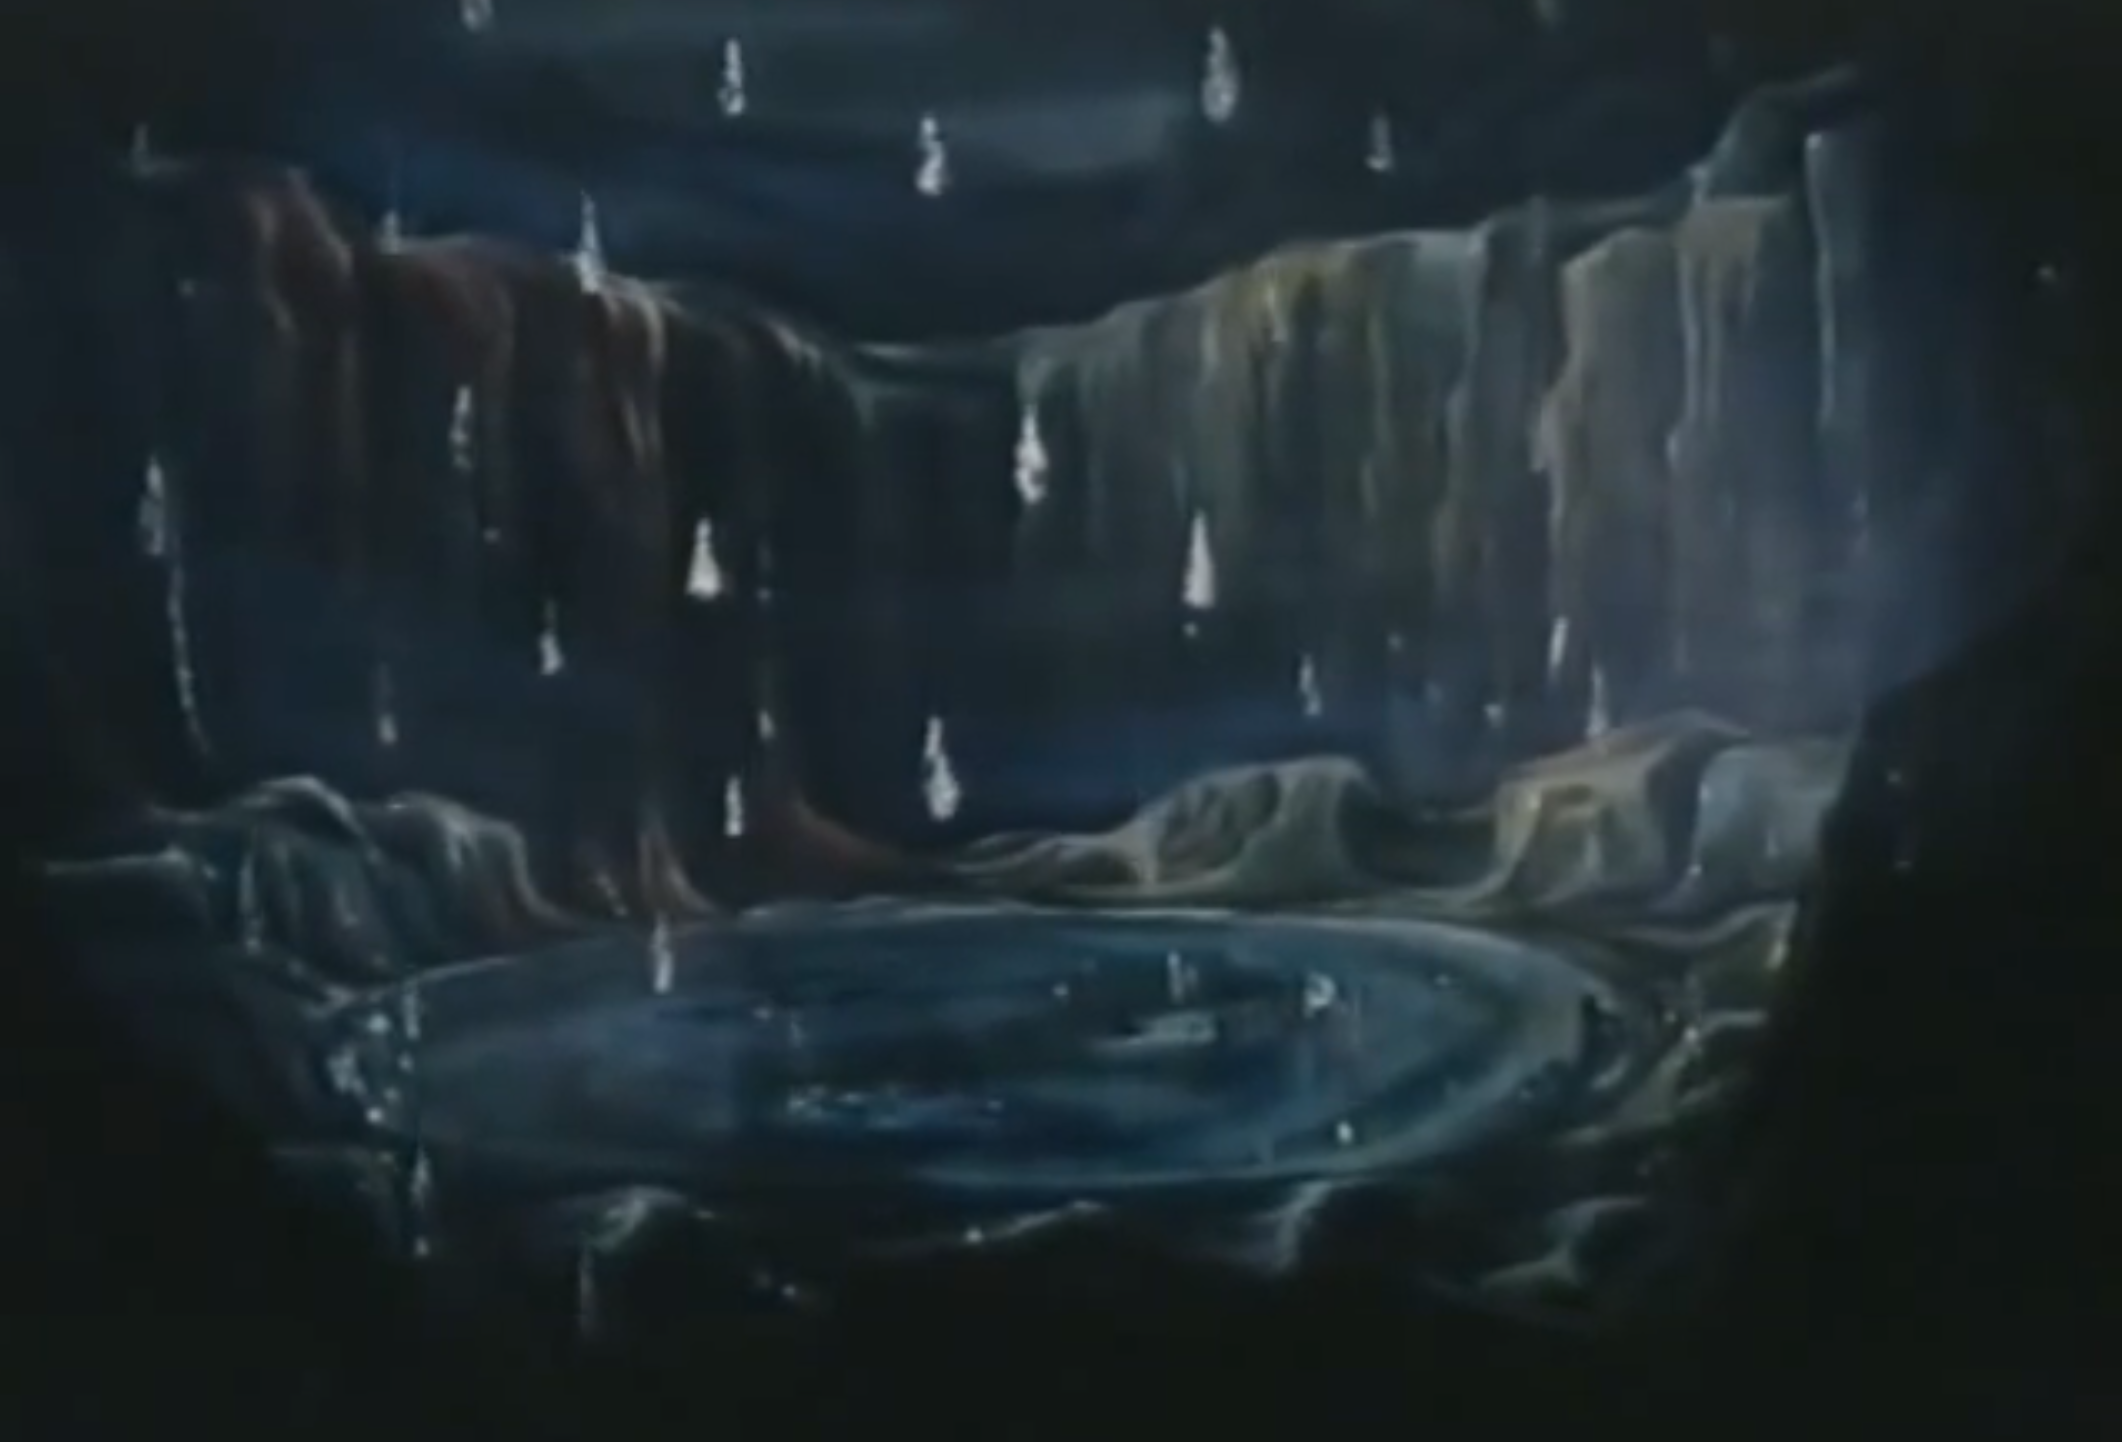 """Lake of tears"" scene from Michael Powell's 1963 television adaptation of  Bartók's  Duke Bluebeard's Castle"